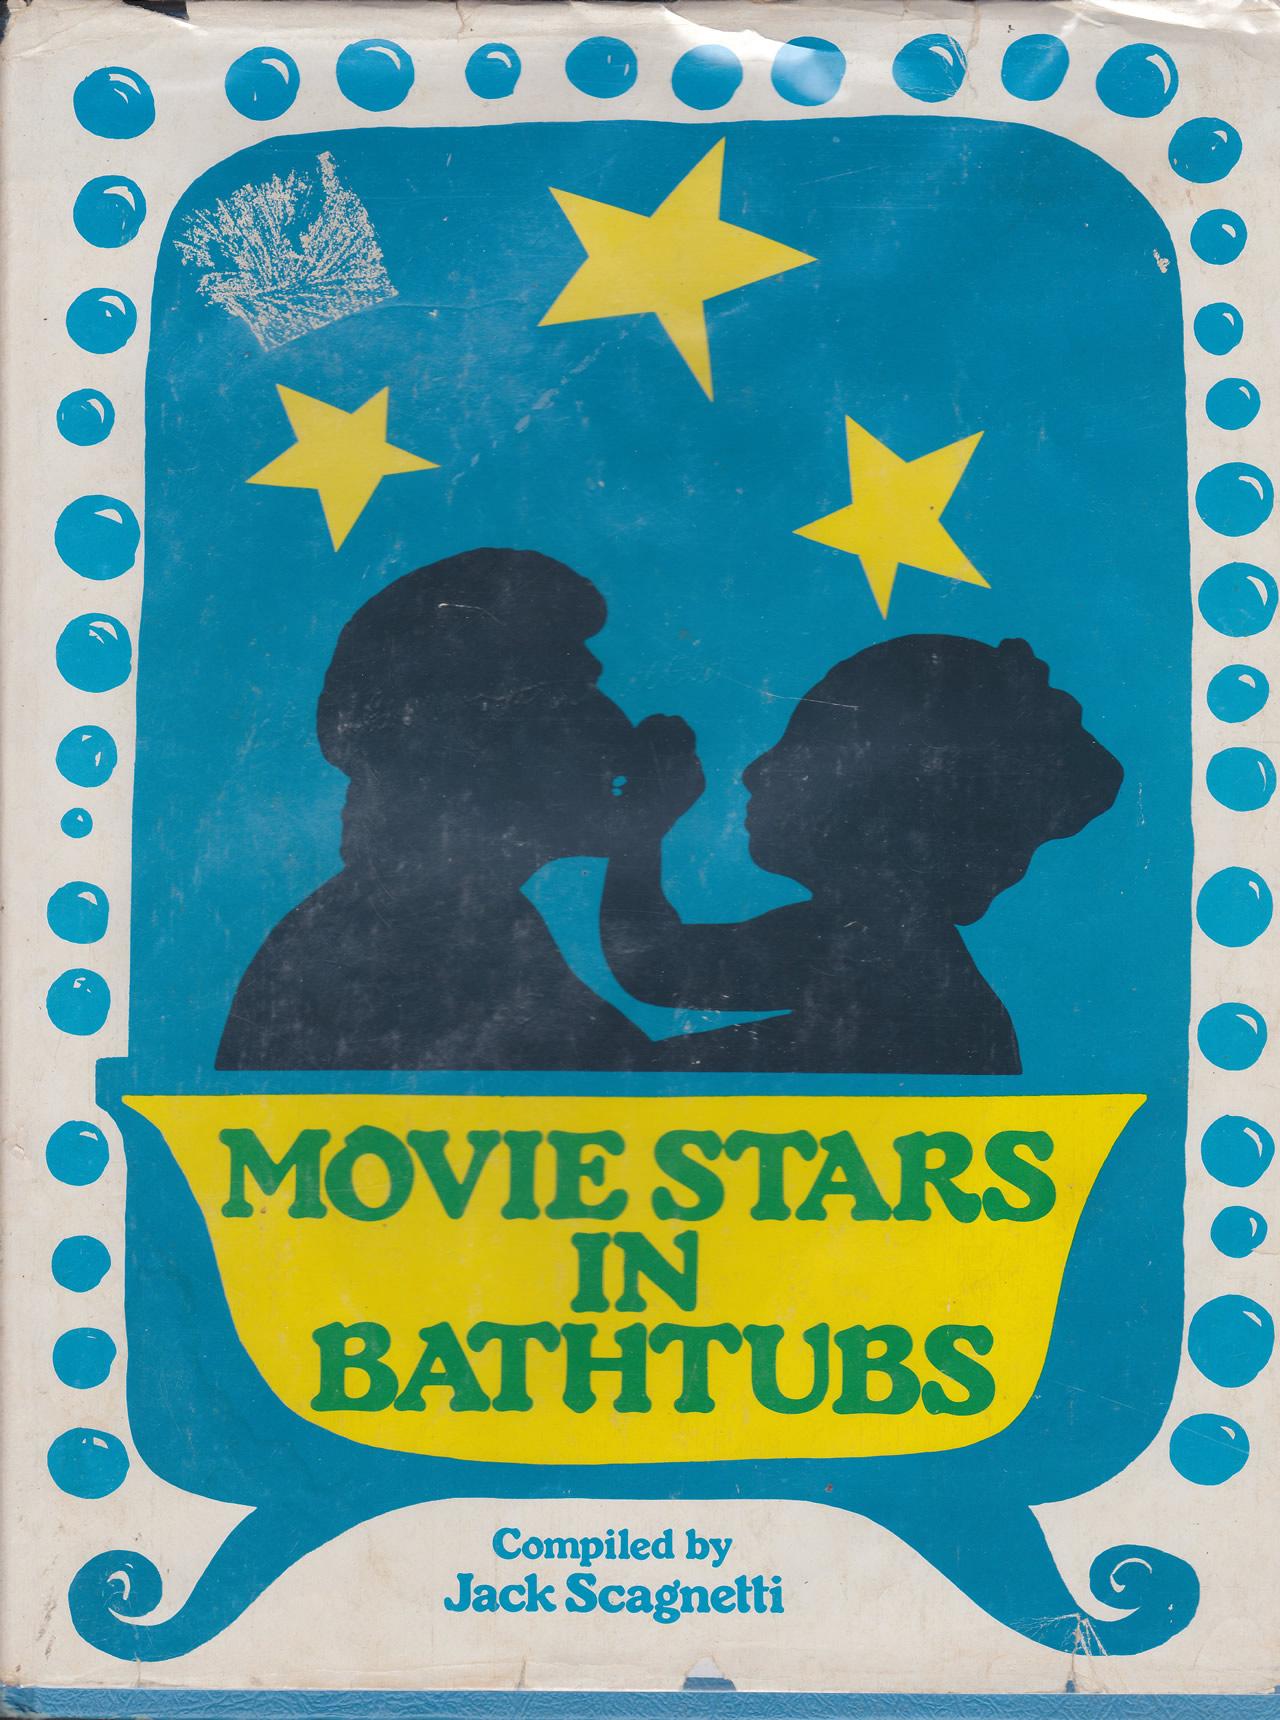 Movie Stars In Bathtubs (1975)